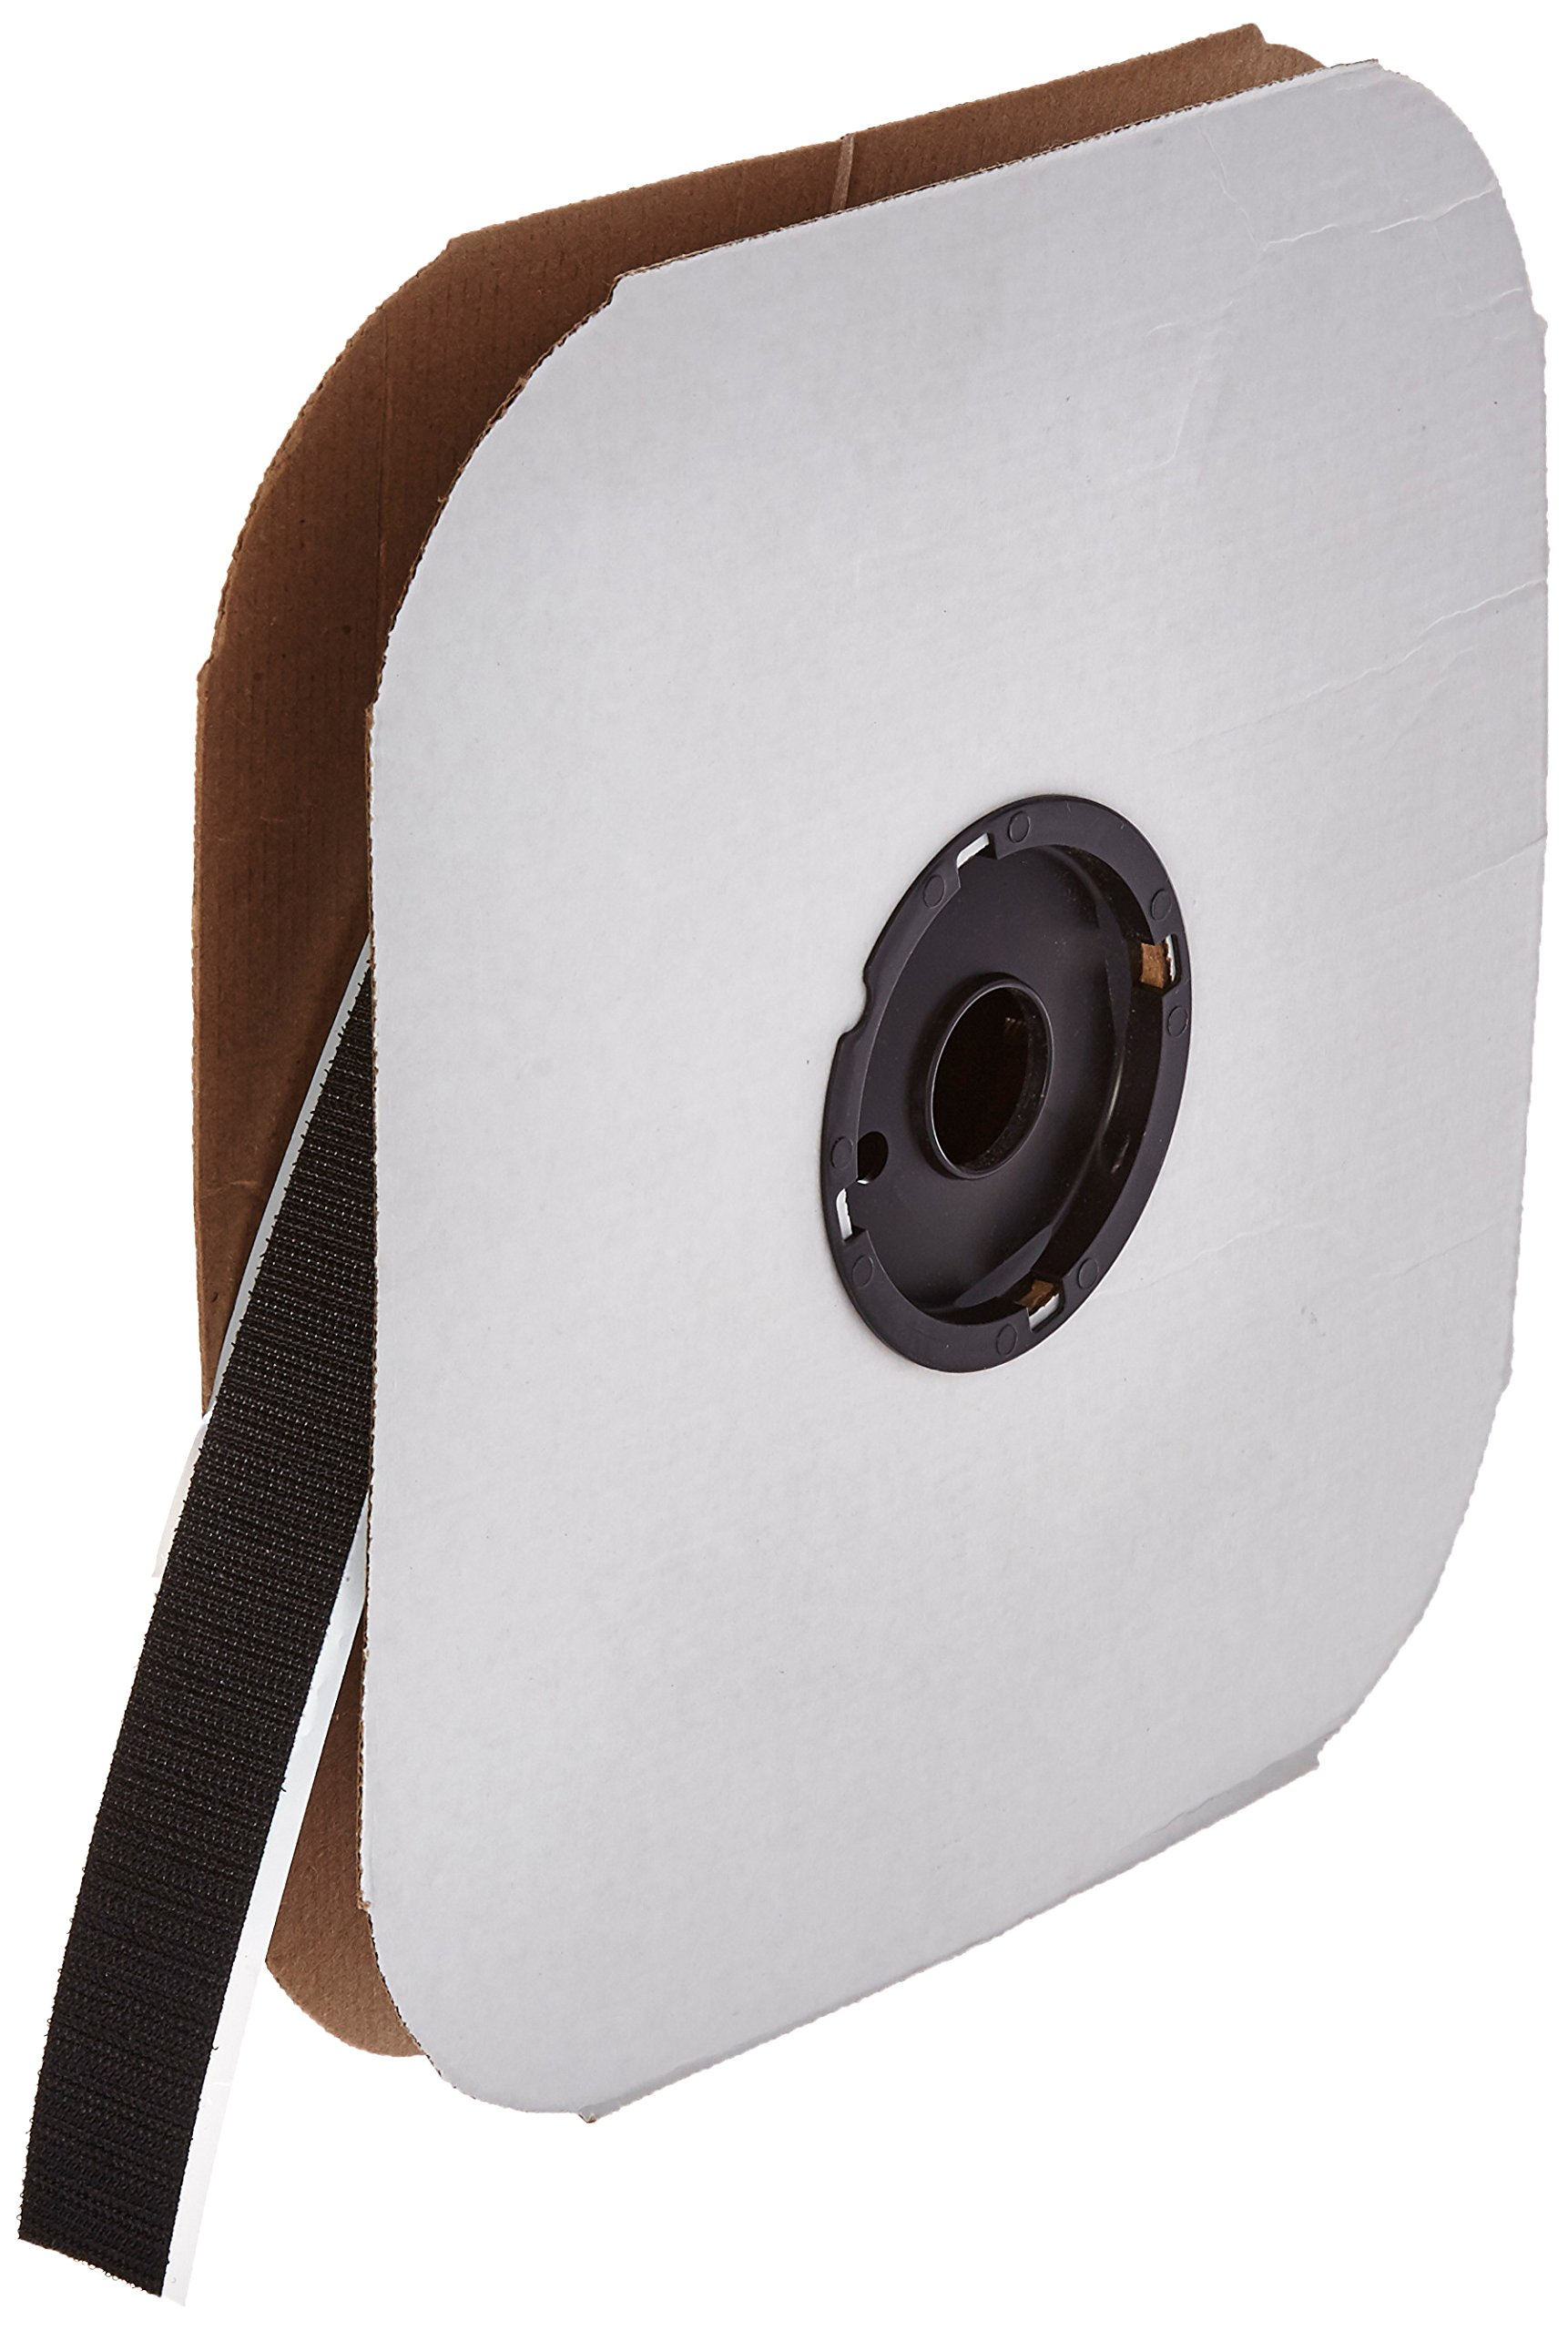 VELCRO 3804-SAT-PSA/H Black Woven Nylon Hook 88, 0132 Adhesive Backed, 1'' Wide, 50' Length